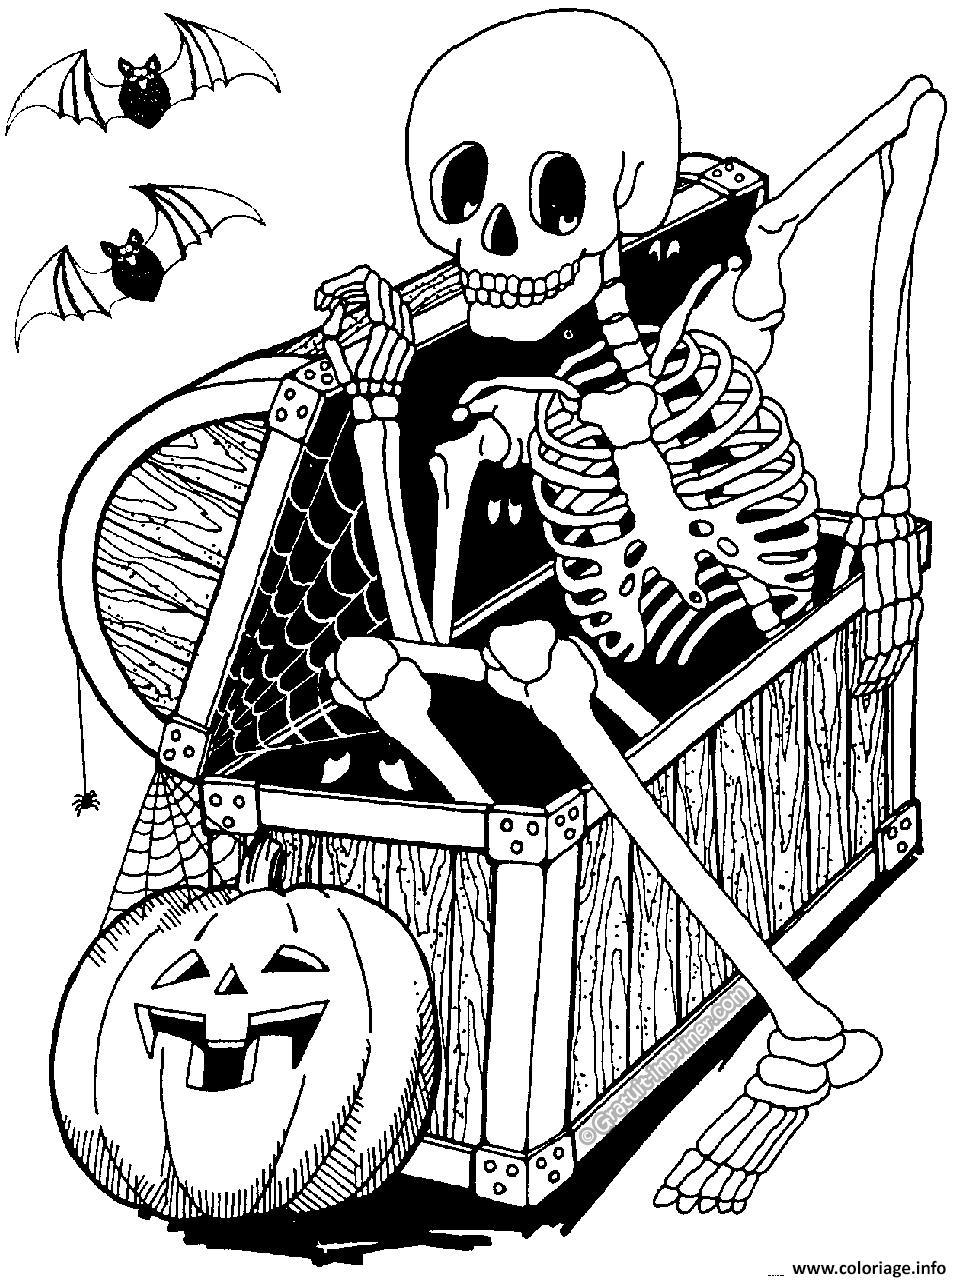 Coloriage Halloween Adulte Squelette Dessin